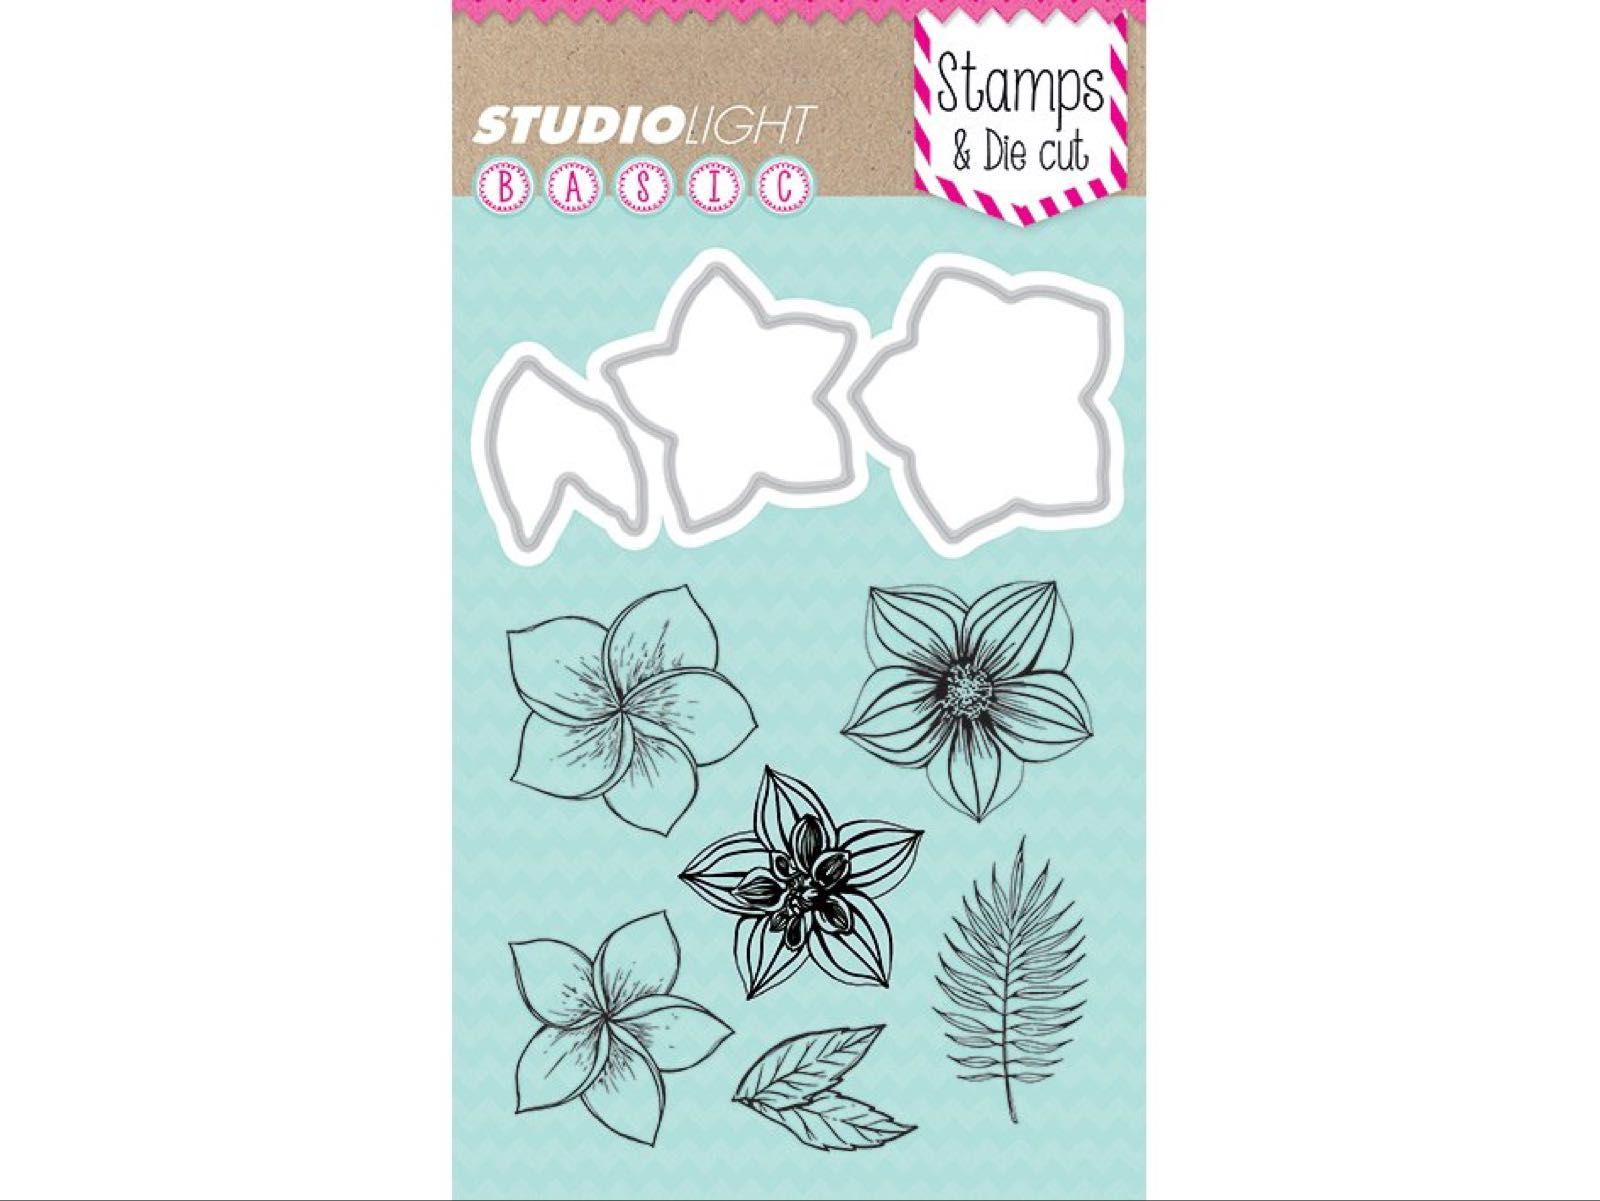 StudioLight basics stamp & die cut A6 nr.10. Stempel og dies-sett.